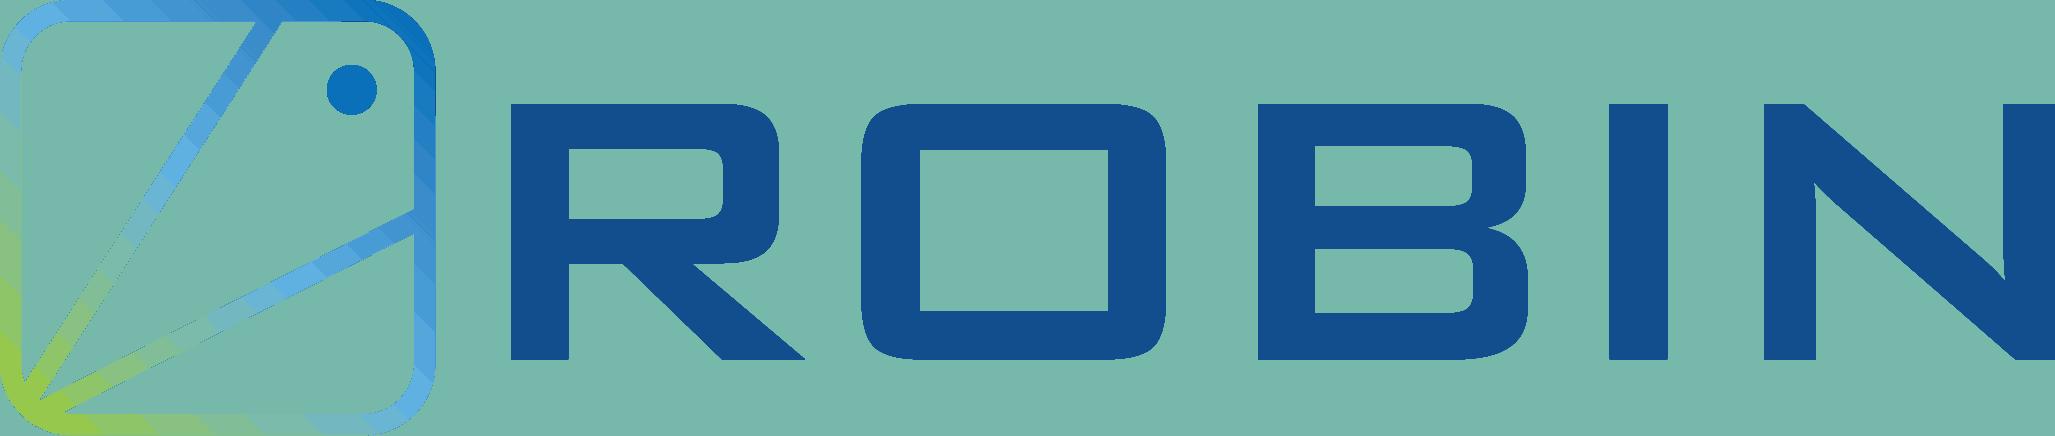 robin-new-logo-white-bg-1